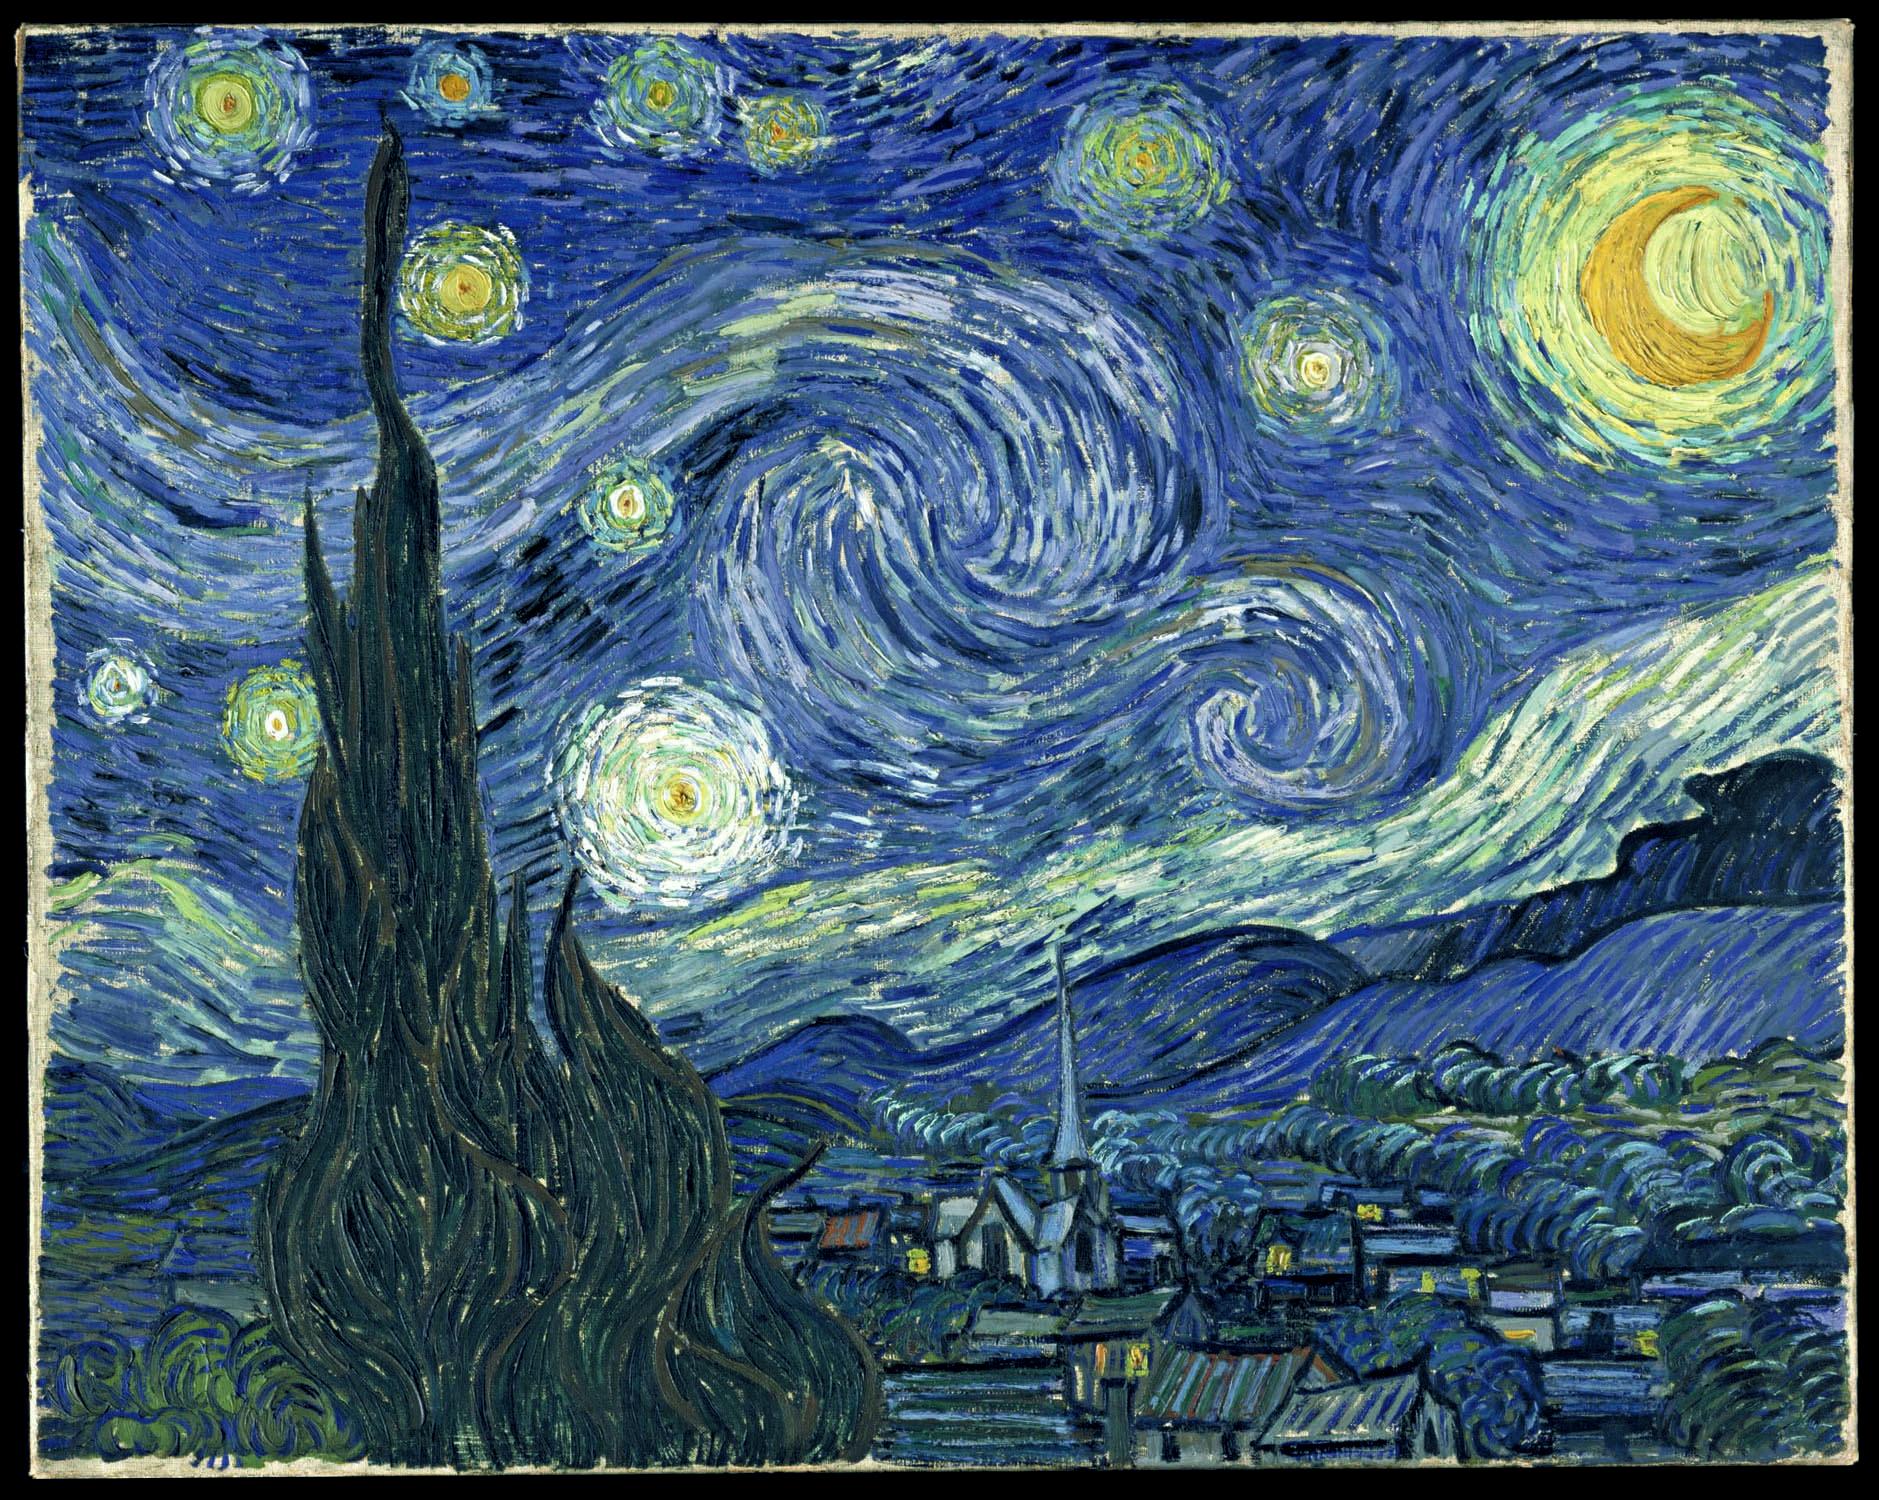 V.Van Gogh, Notte stellata 1889